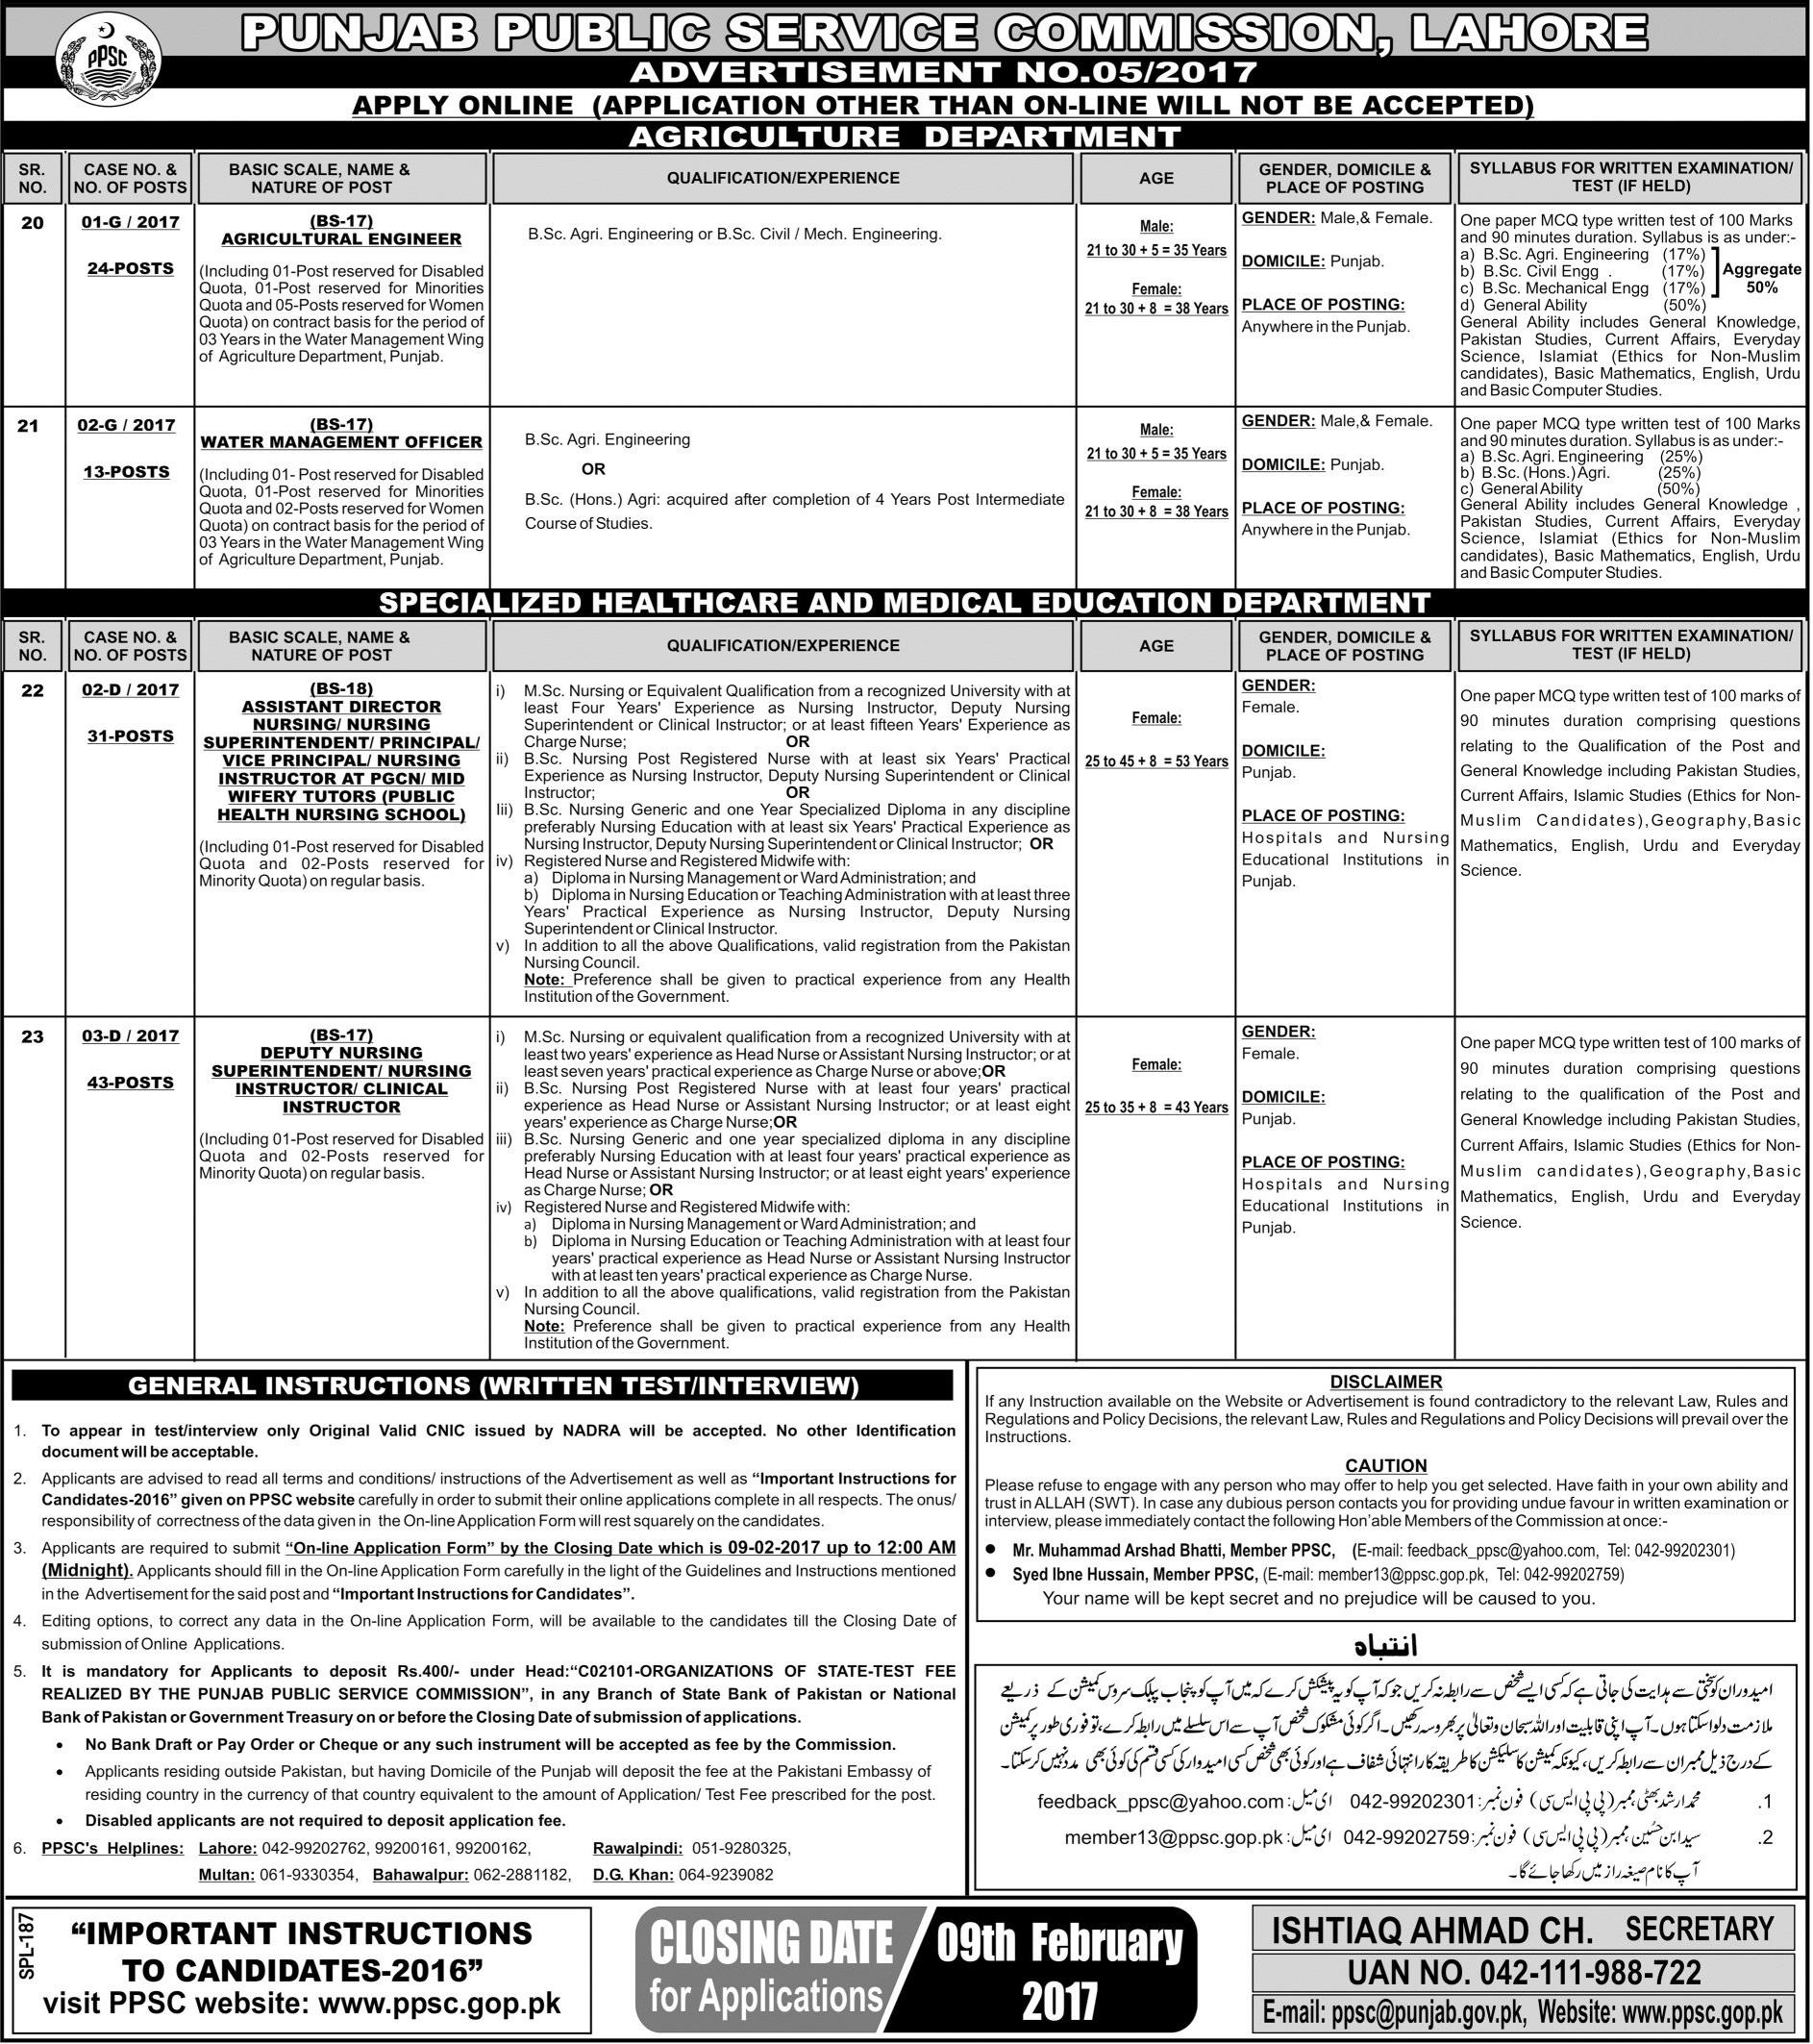 Special Education Department Punjab Jobs 2017 Eligibility Criteria ...